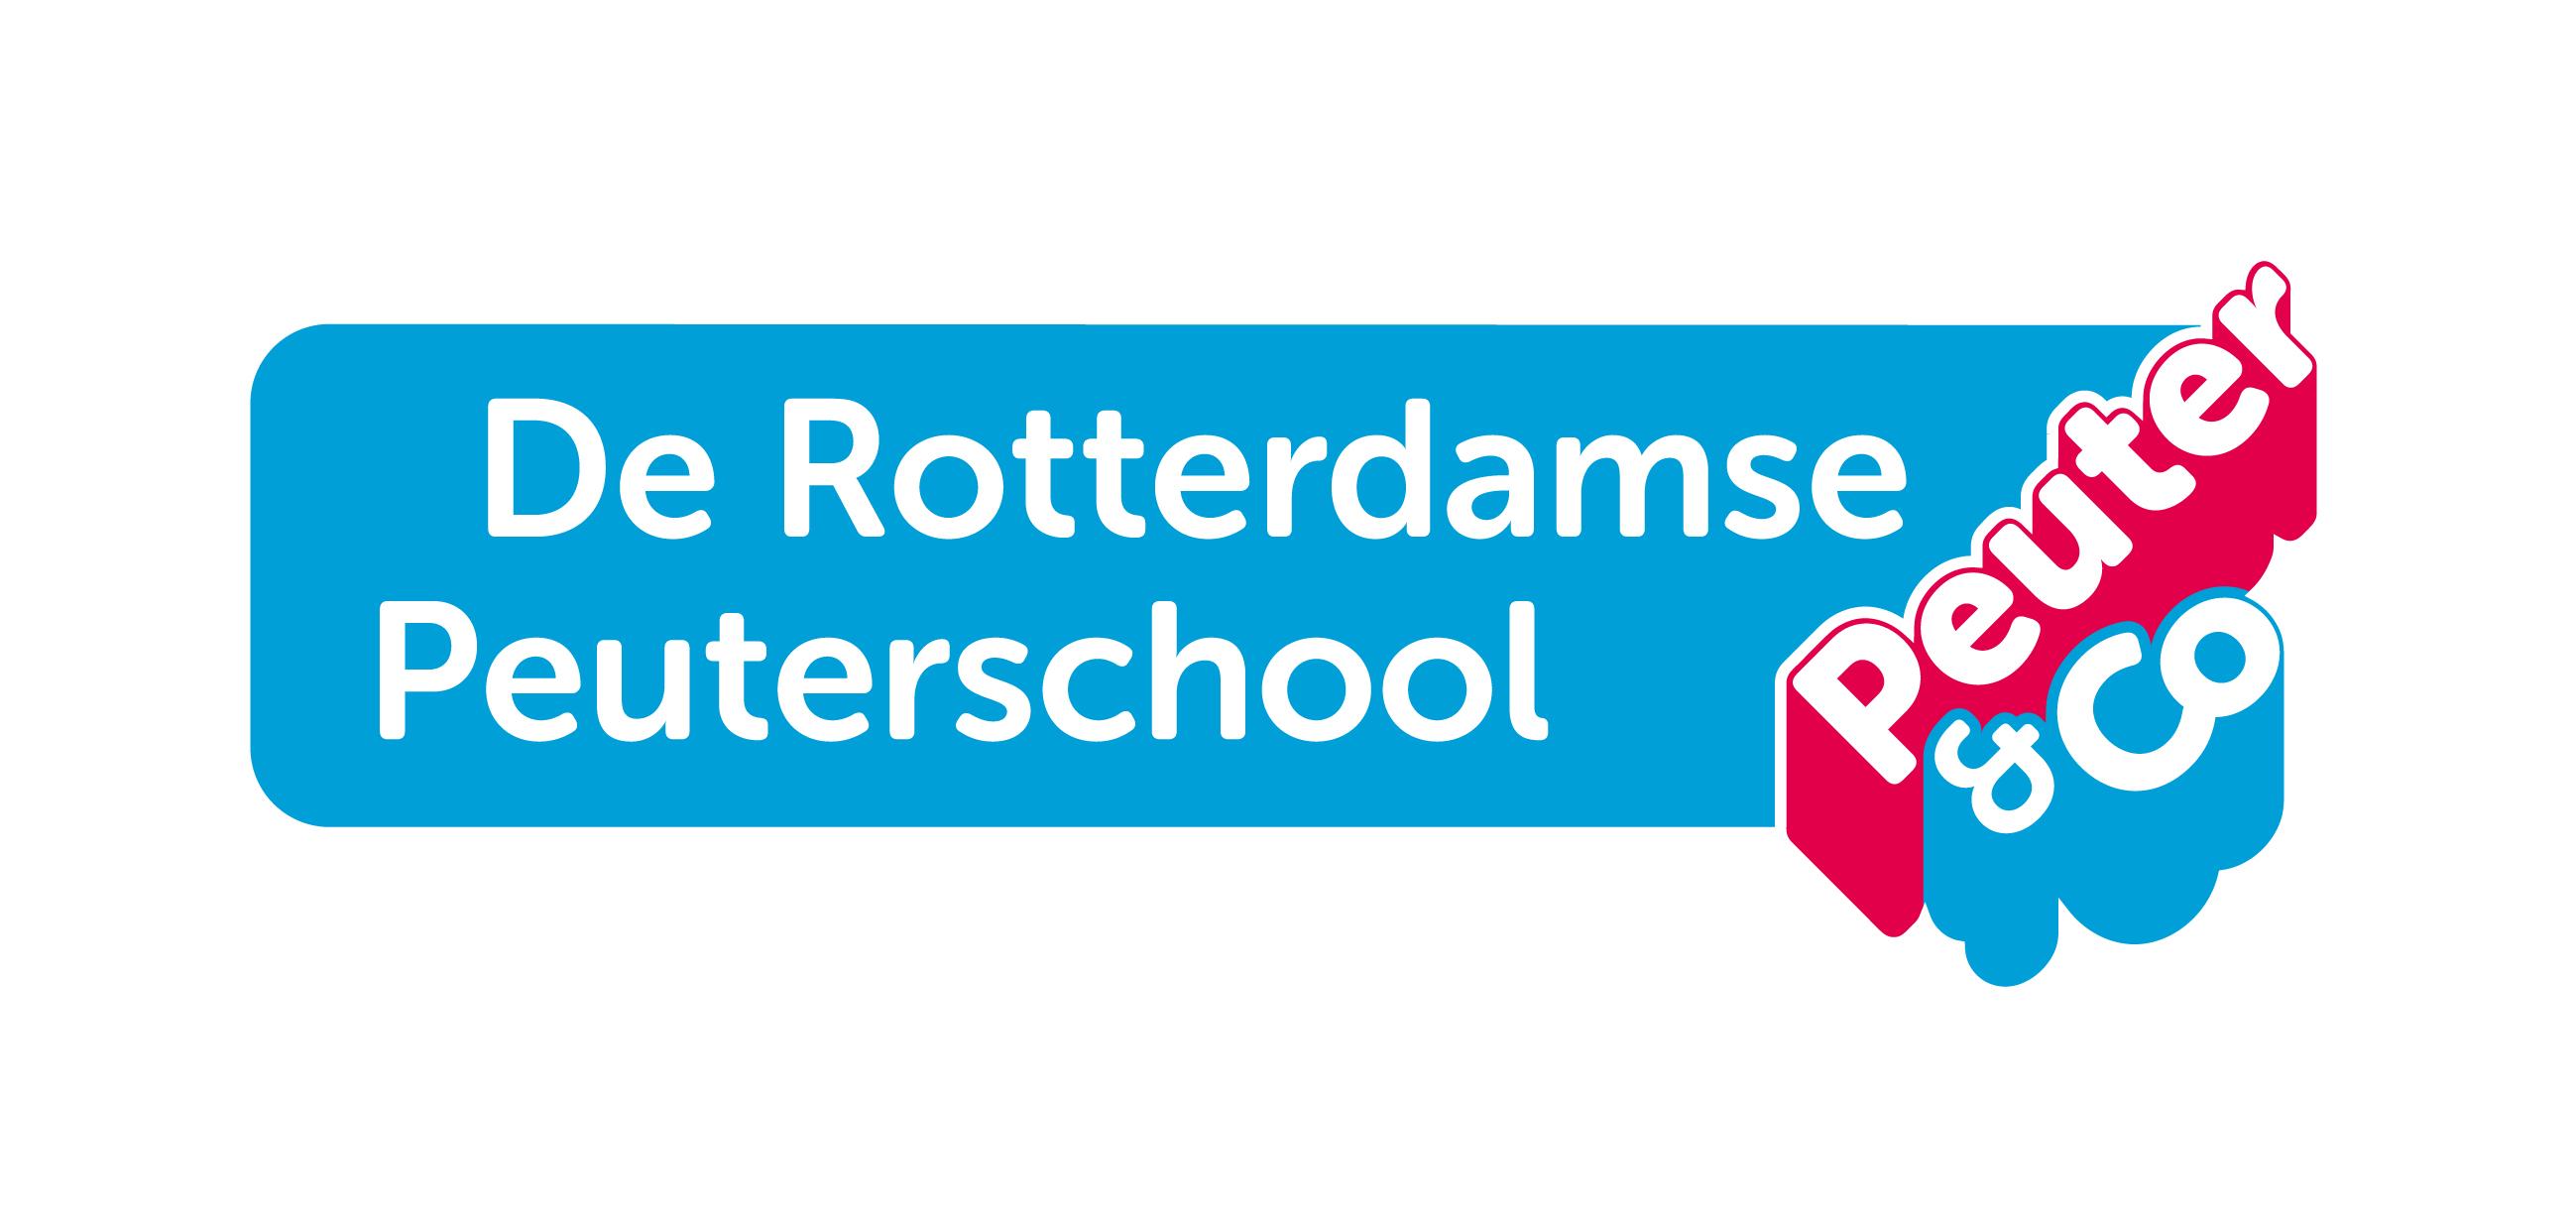 De Rotterdamse Peuterschool